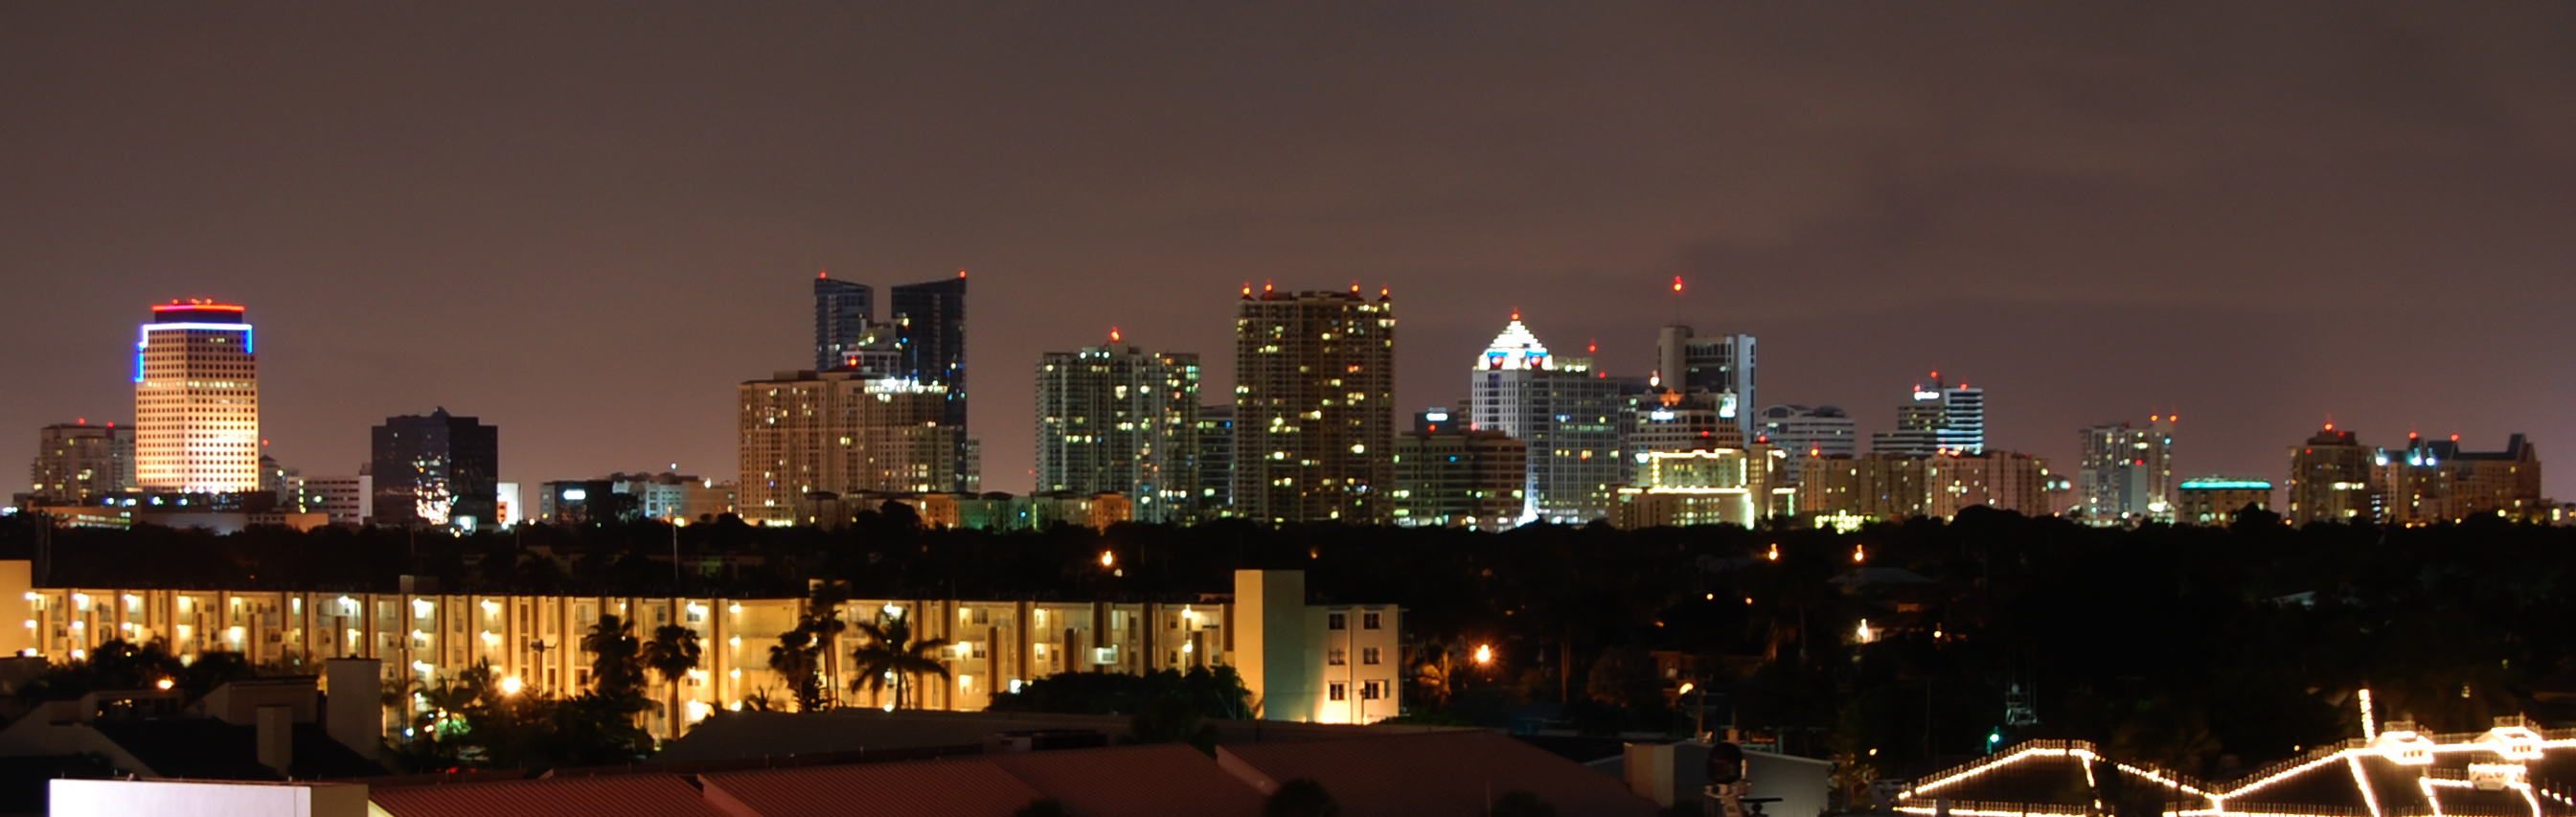 Fort Lauderdale, Florida, Broward County skyline